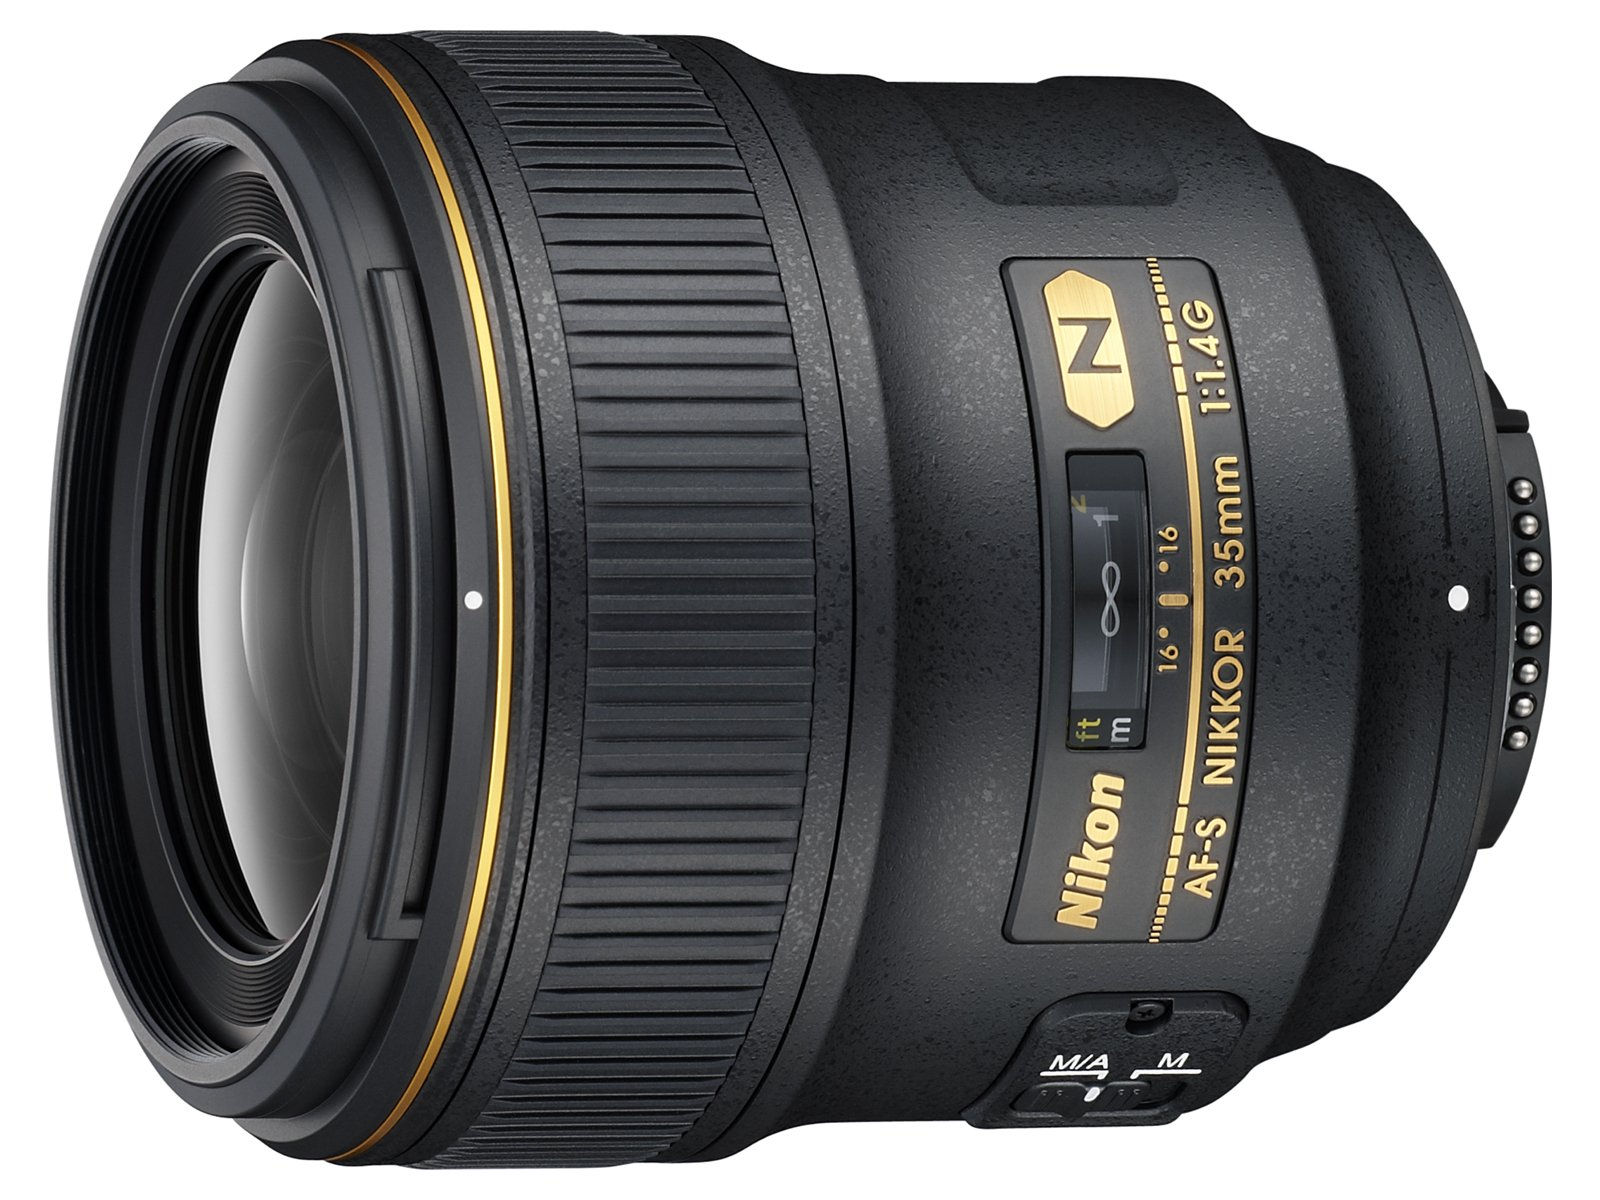 Nikon AF FX NIKKOR 35mm f/1.4G Fixed Focal Length Lens with Auto Focus for Nikon DSLR Cameras by Nikon